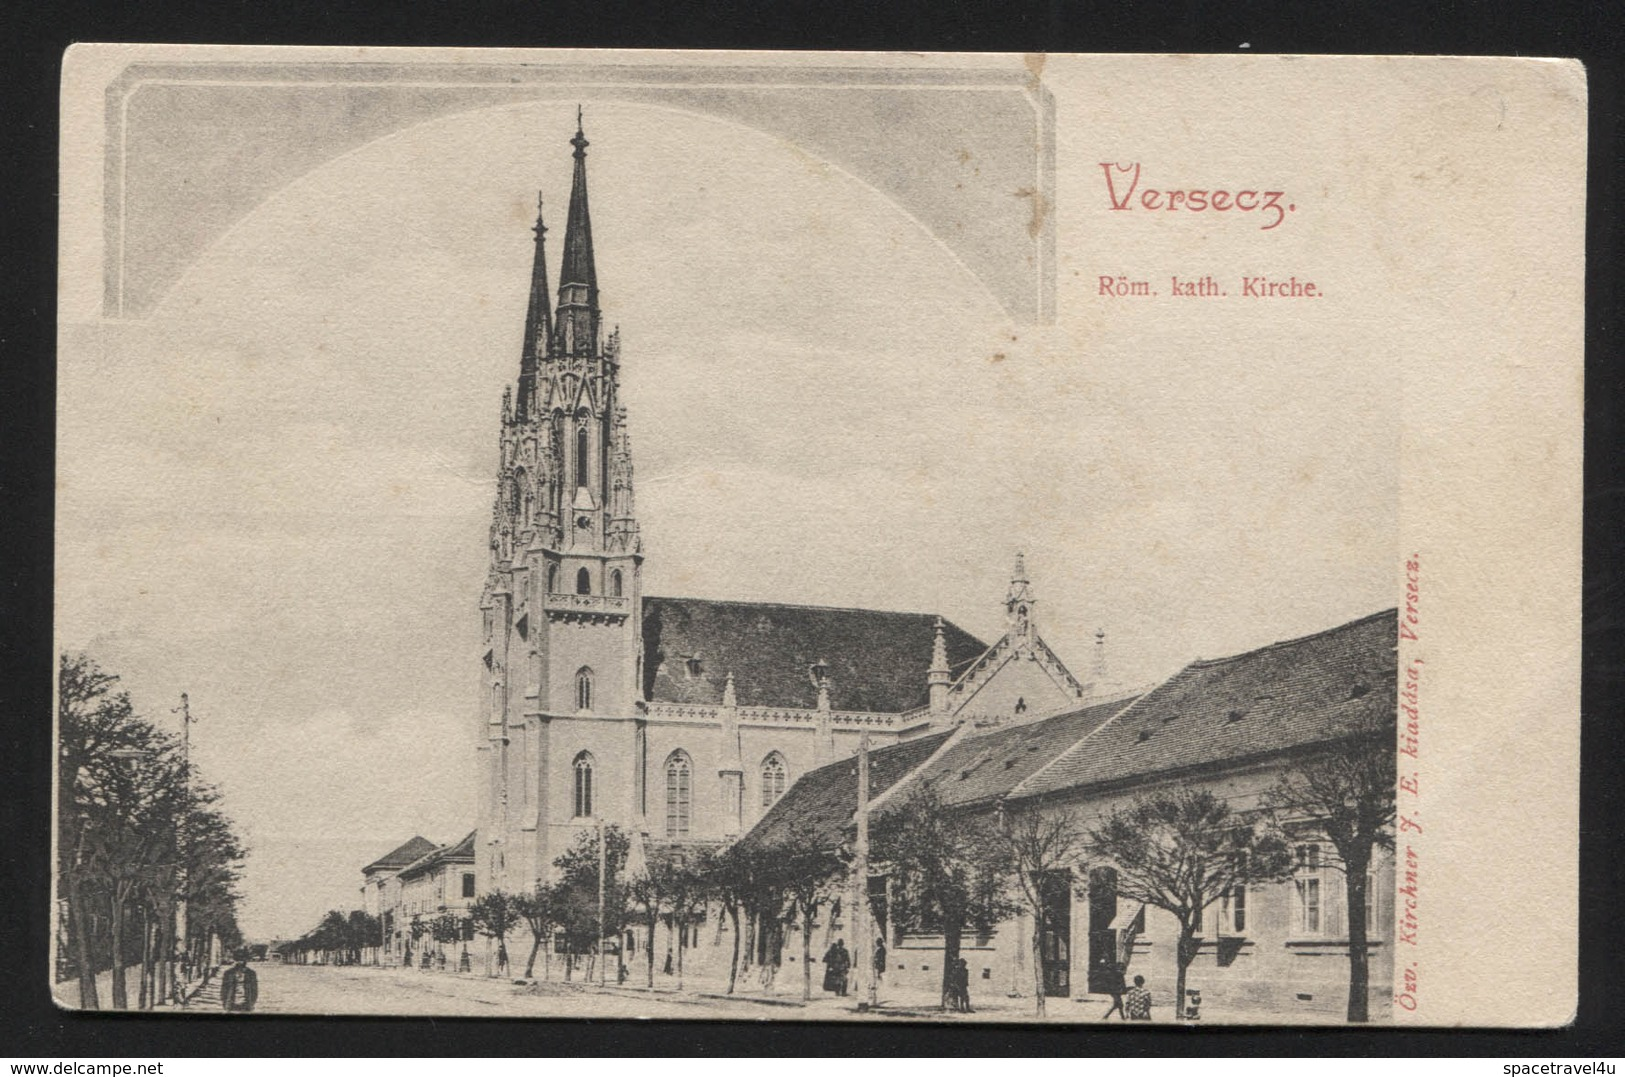 AUSTRO-HUNGARIAN (Now Serbia,Vojvodina) VRŠAC (hungarian-Versec) - Church - VINTAGE POSTCARD (APAT#36) - Postcards